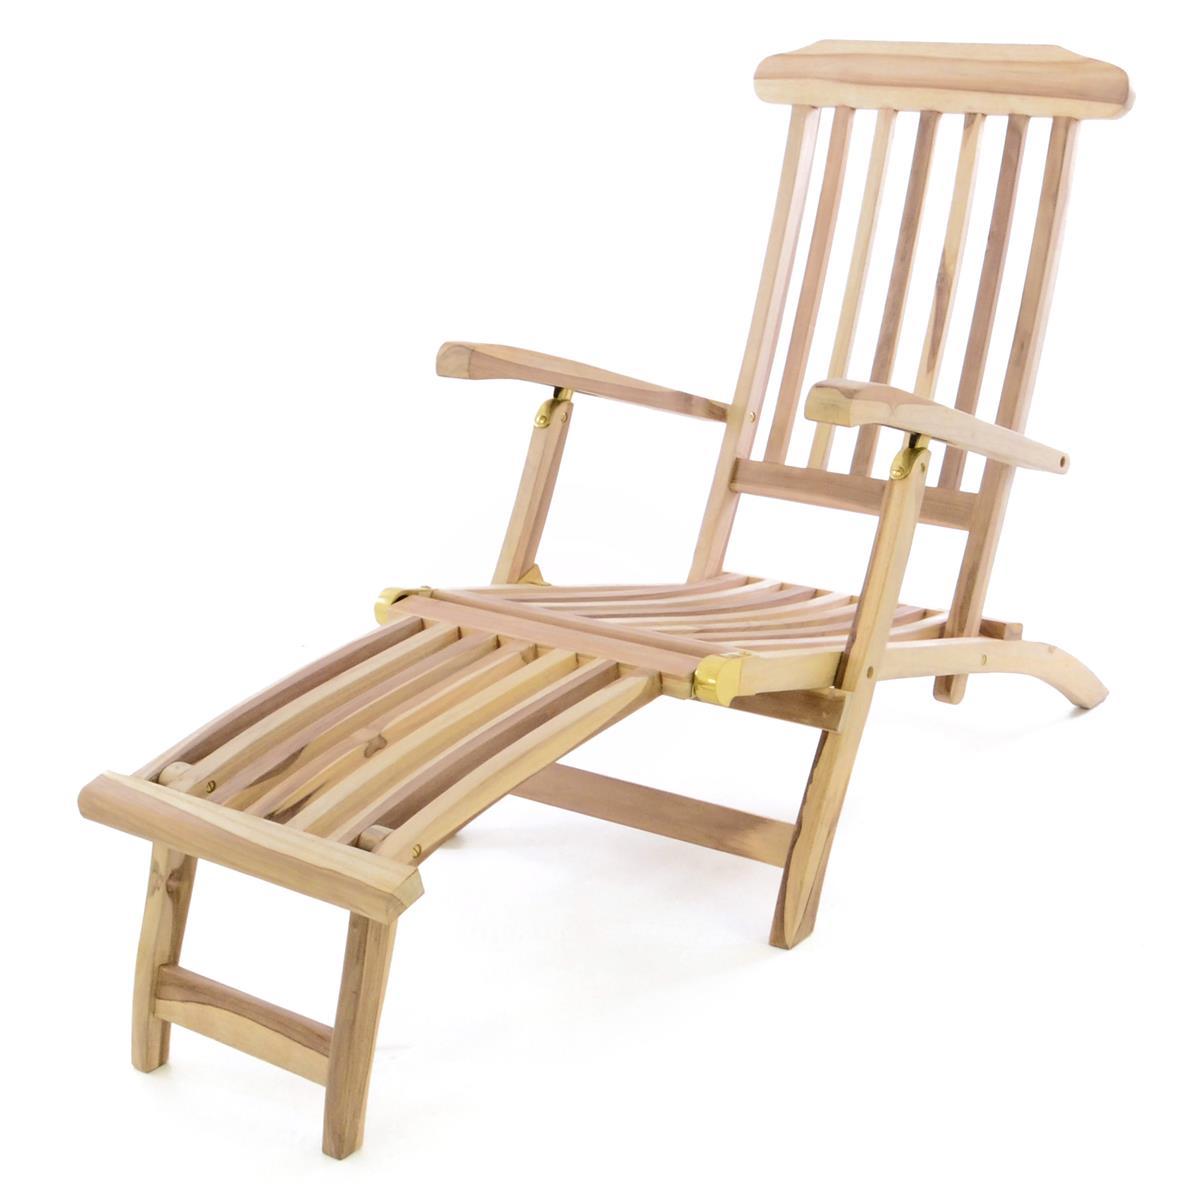 "DIVERO Liegestuhl Deckchair ""Florentine"" Fußteil abnehmbar Teak Holz natur"